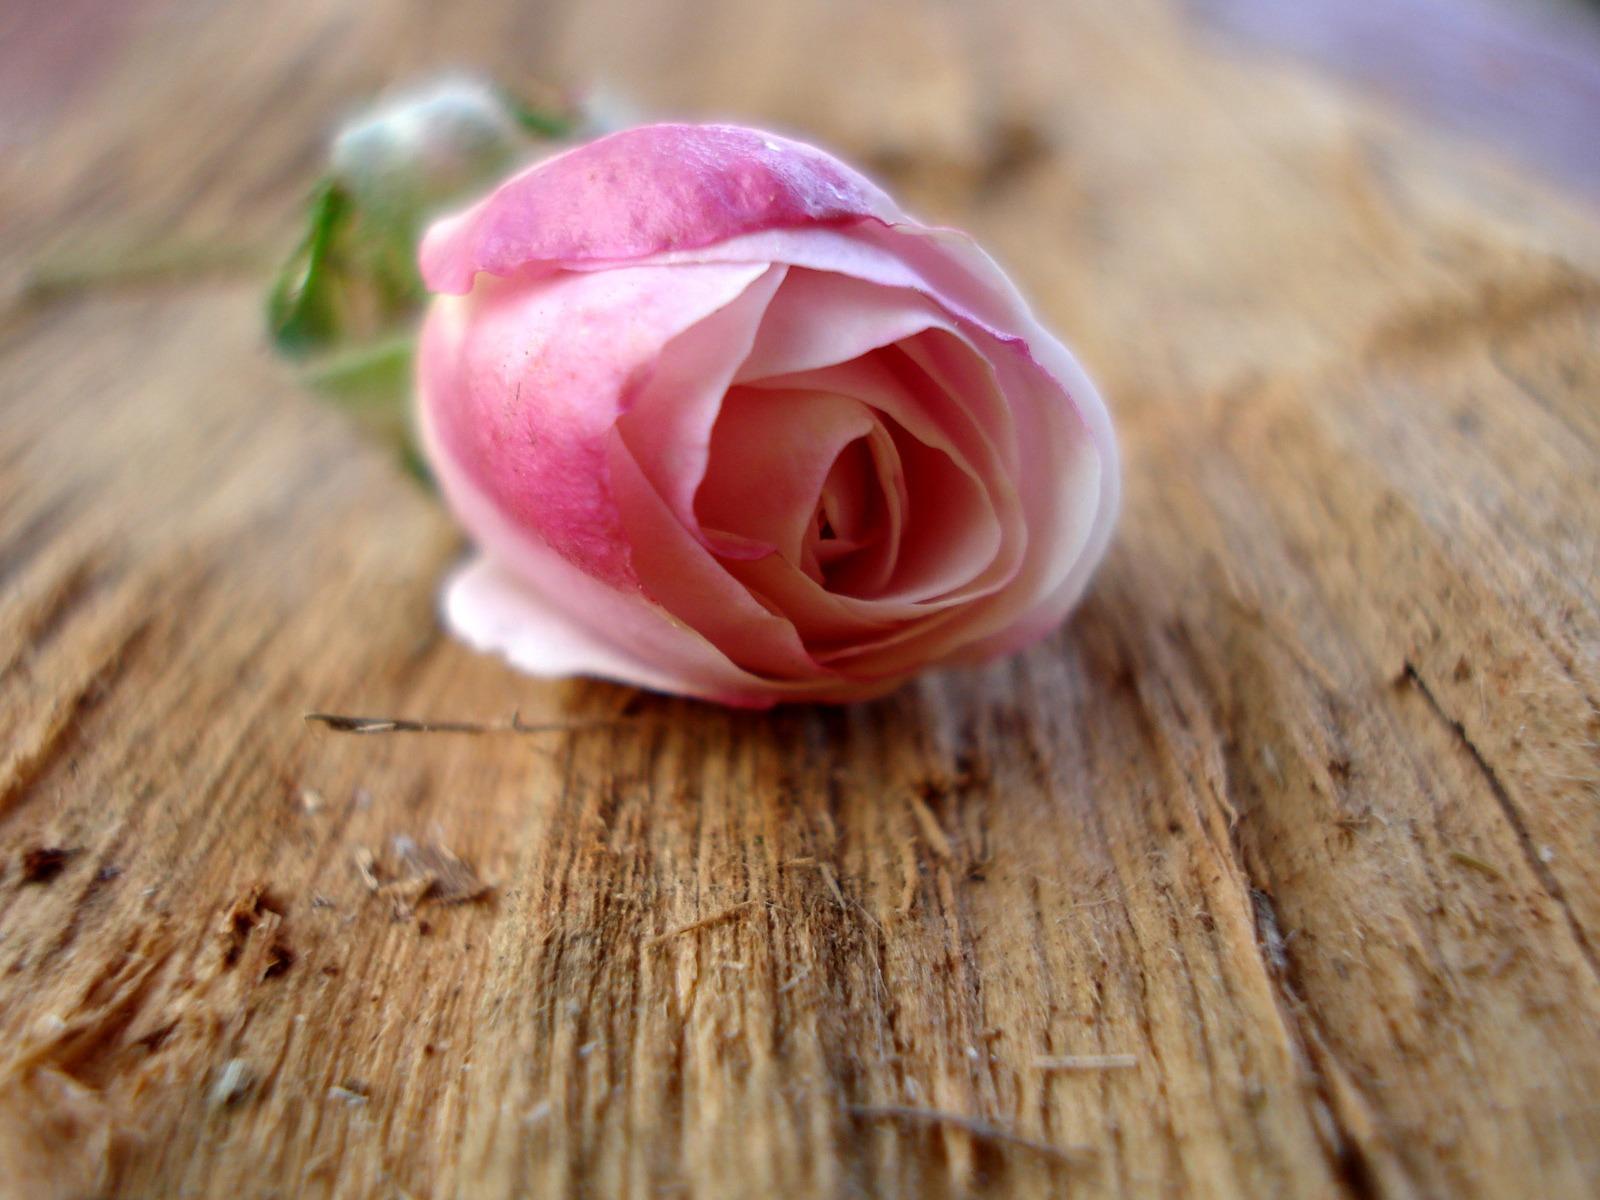 Fond D Ecran De Fleur Rose Idee D Image De Fleur